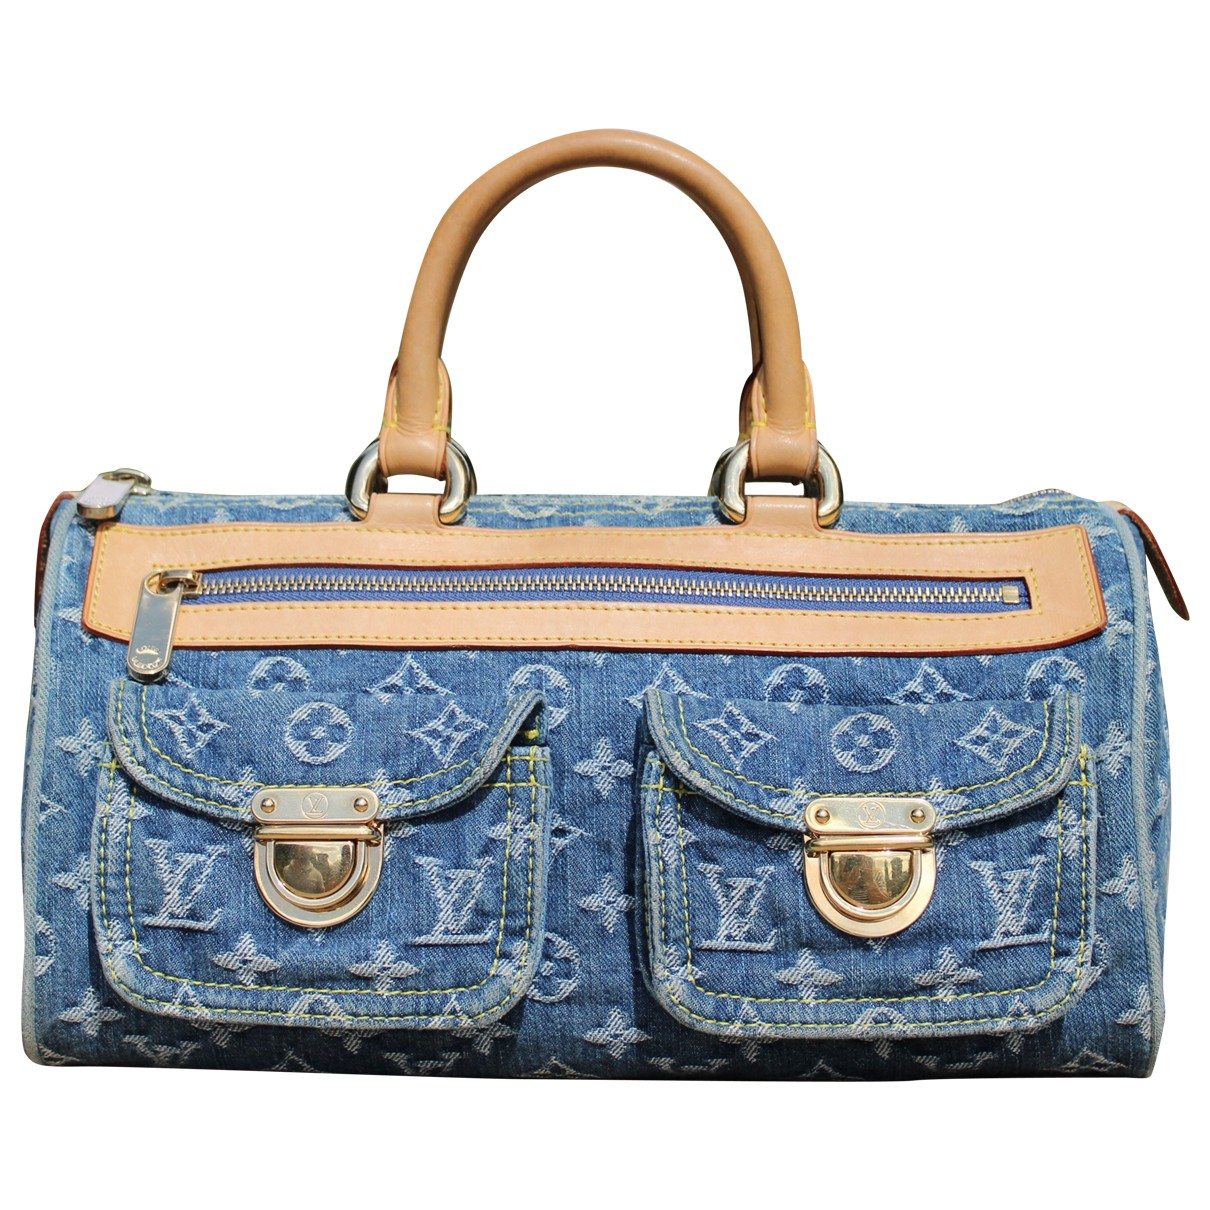 Louis Vuitton - Sac a main Speedy pour femme en toile - bleu